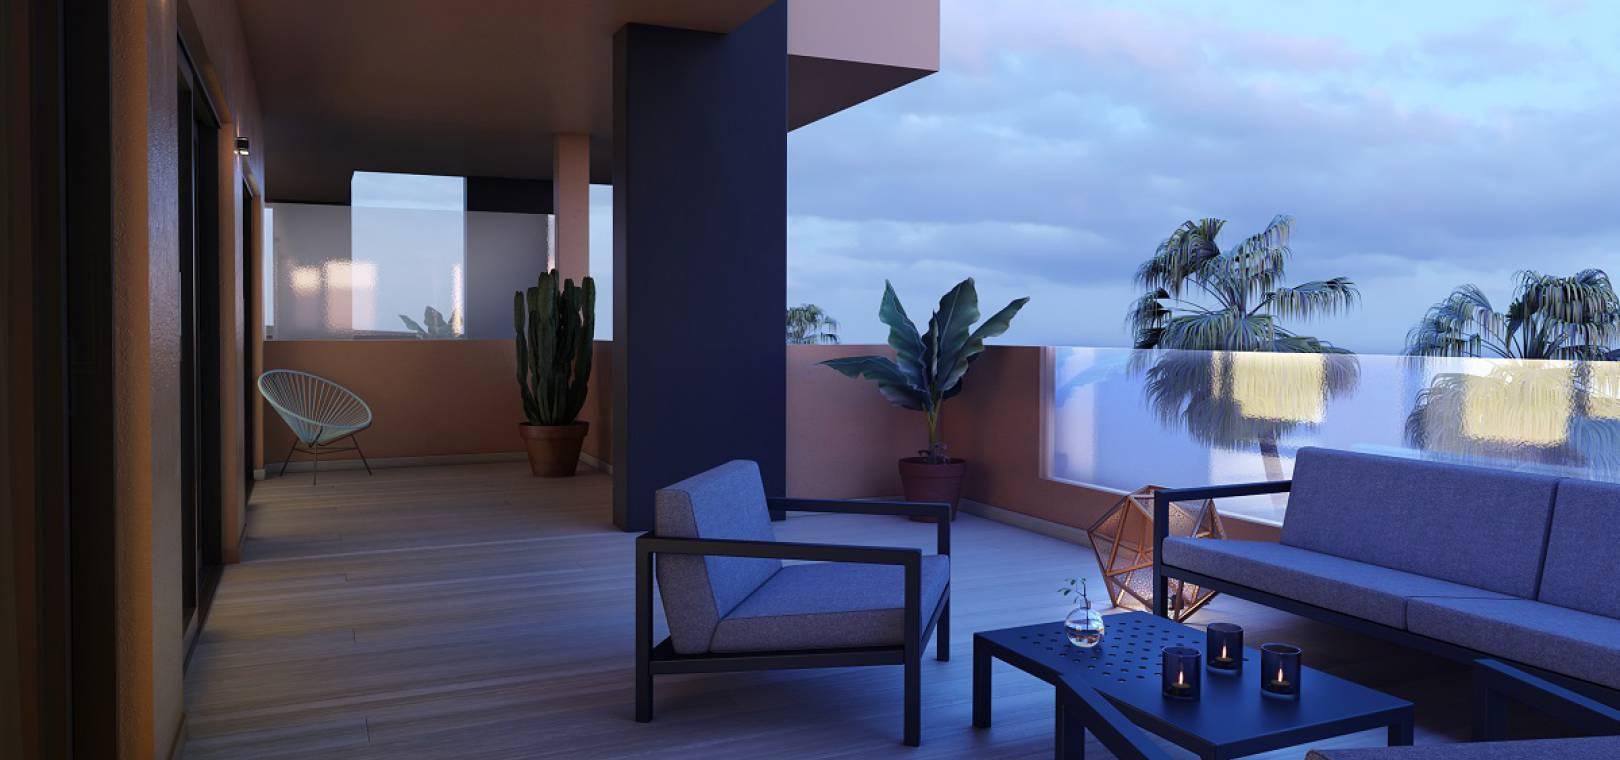 Palapa_Golf_Villamartin_New_Build_Properties_For_Sale_17